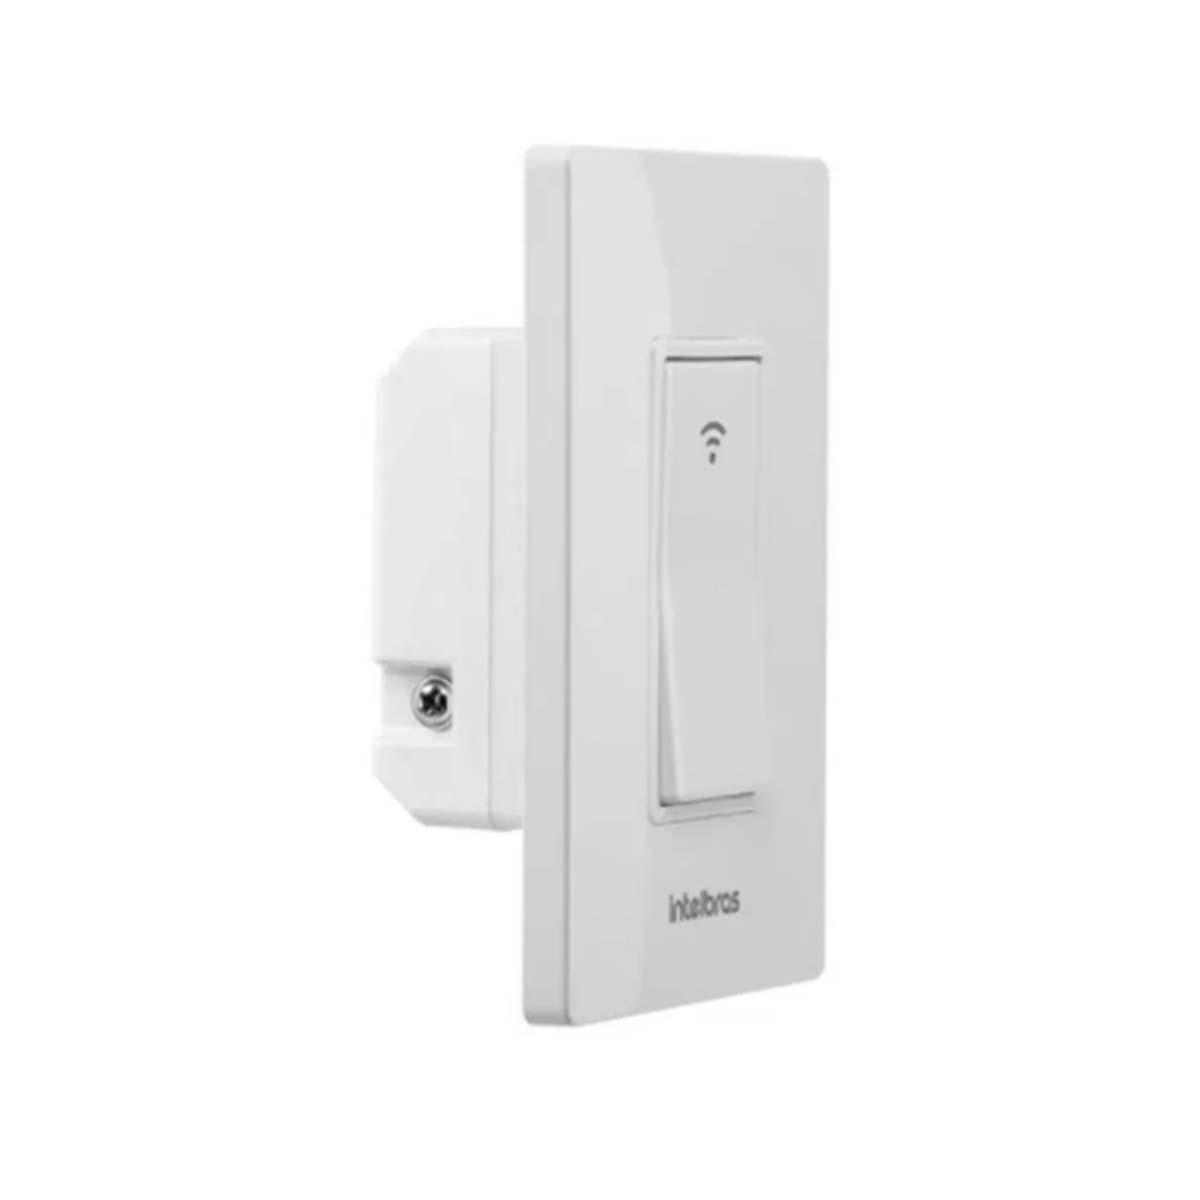 Kit 10 Interruptor Inteligente Intelbras Wi-Fi Ews 101 I